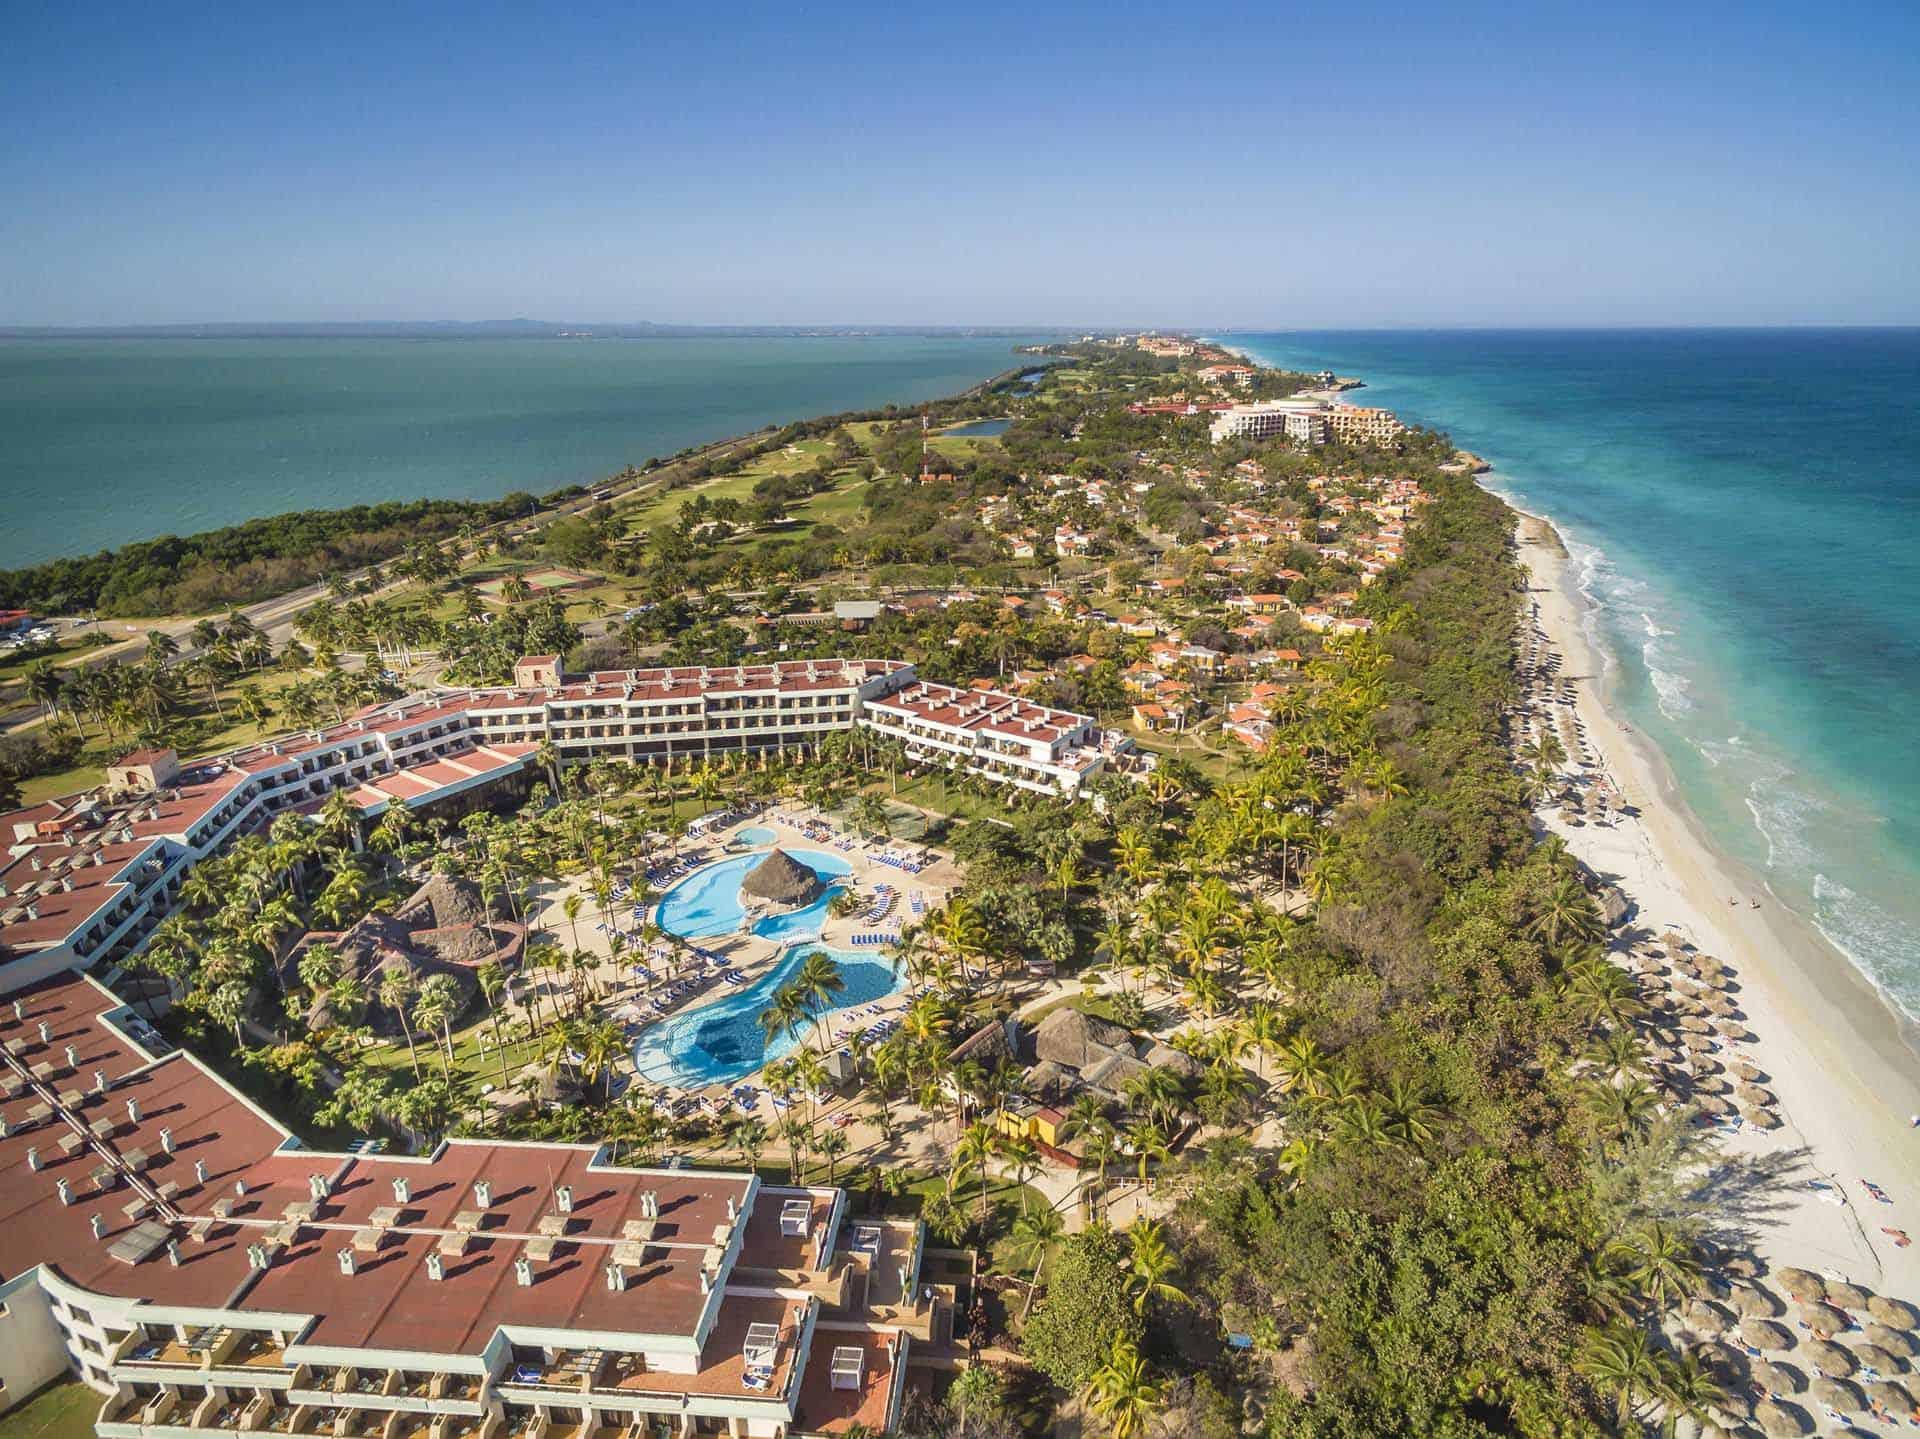 varadero hotel piscine plage mer cuba autrement 3